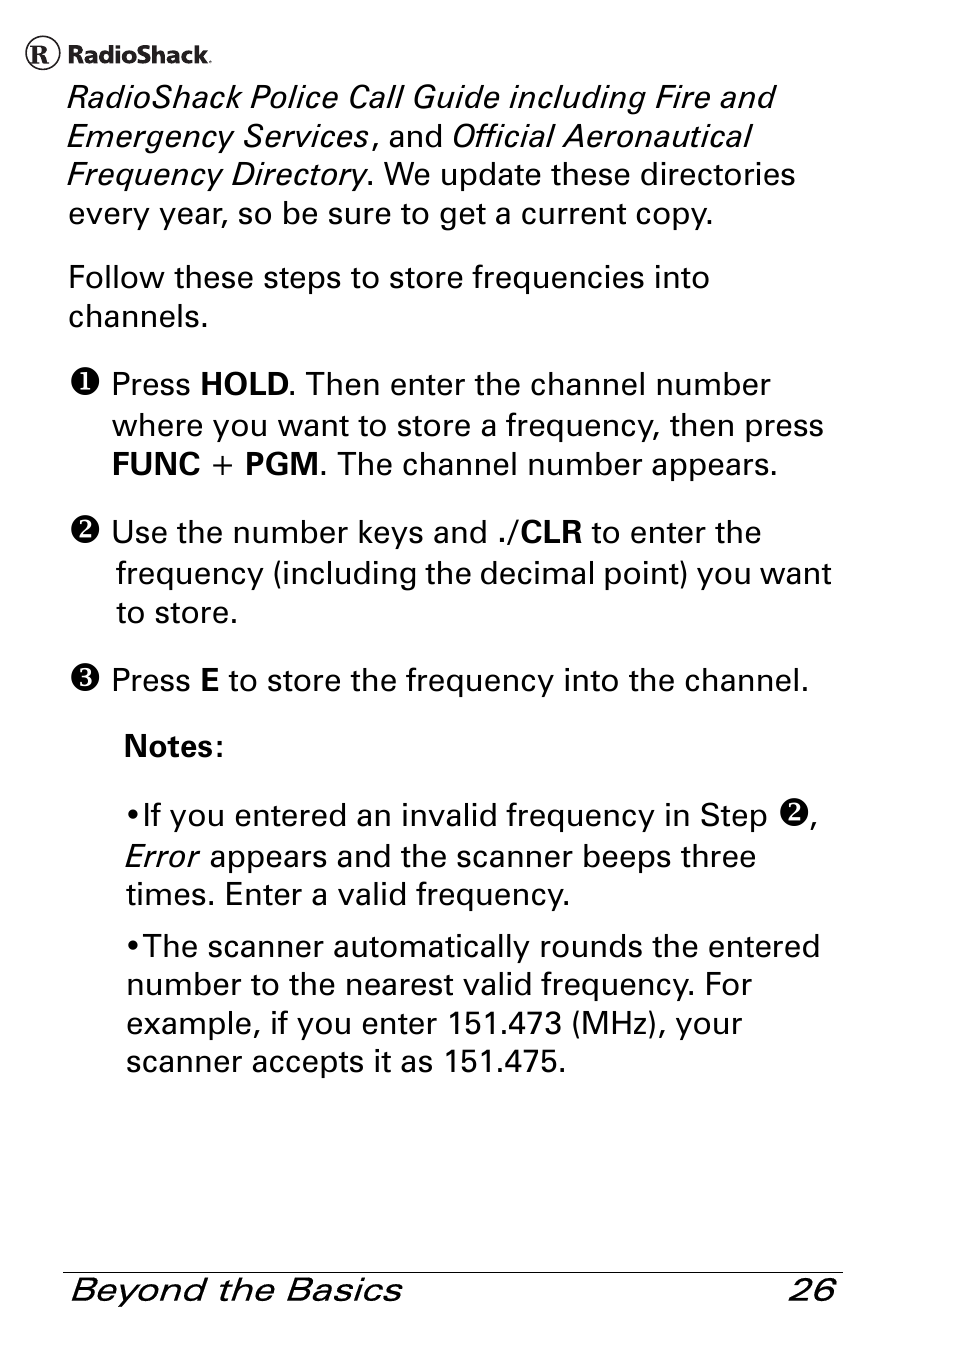 Radio Shack Pro 84 User Manual   Page 26 / 64